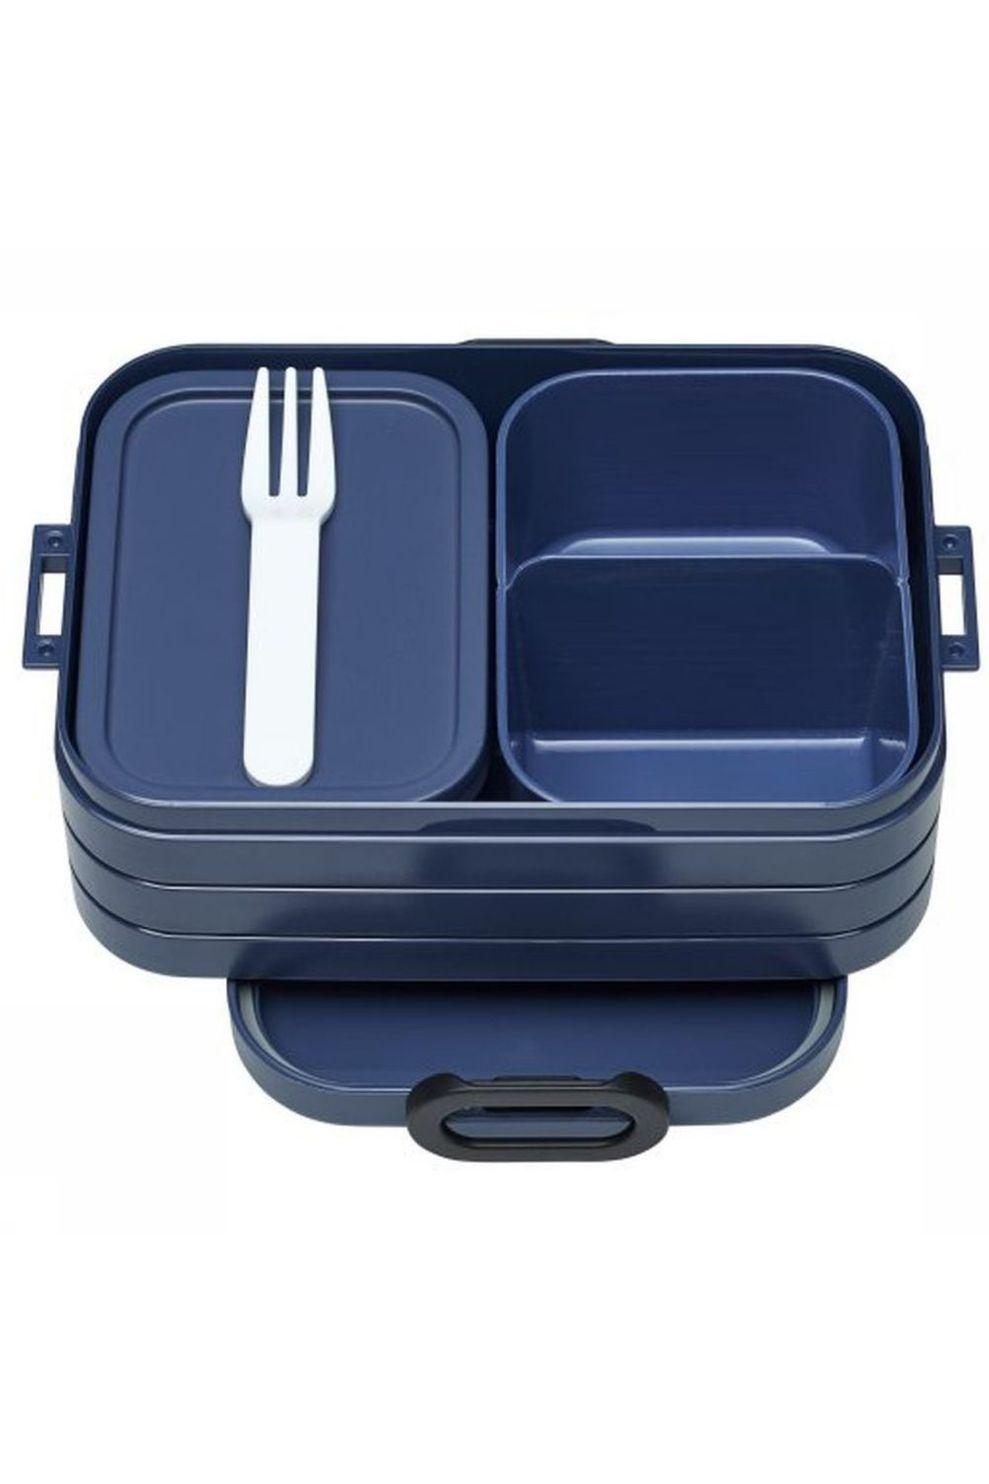 Mepal Voorraadpot Lunchbox Take A Break Bento Midi - Blauw